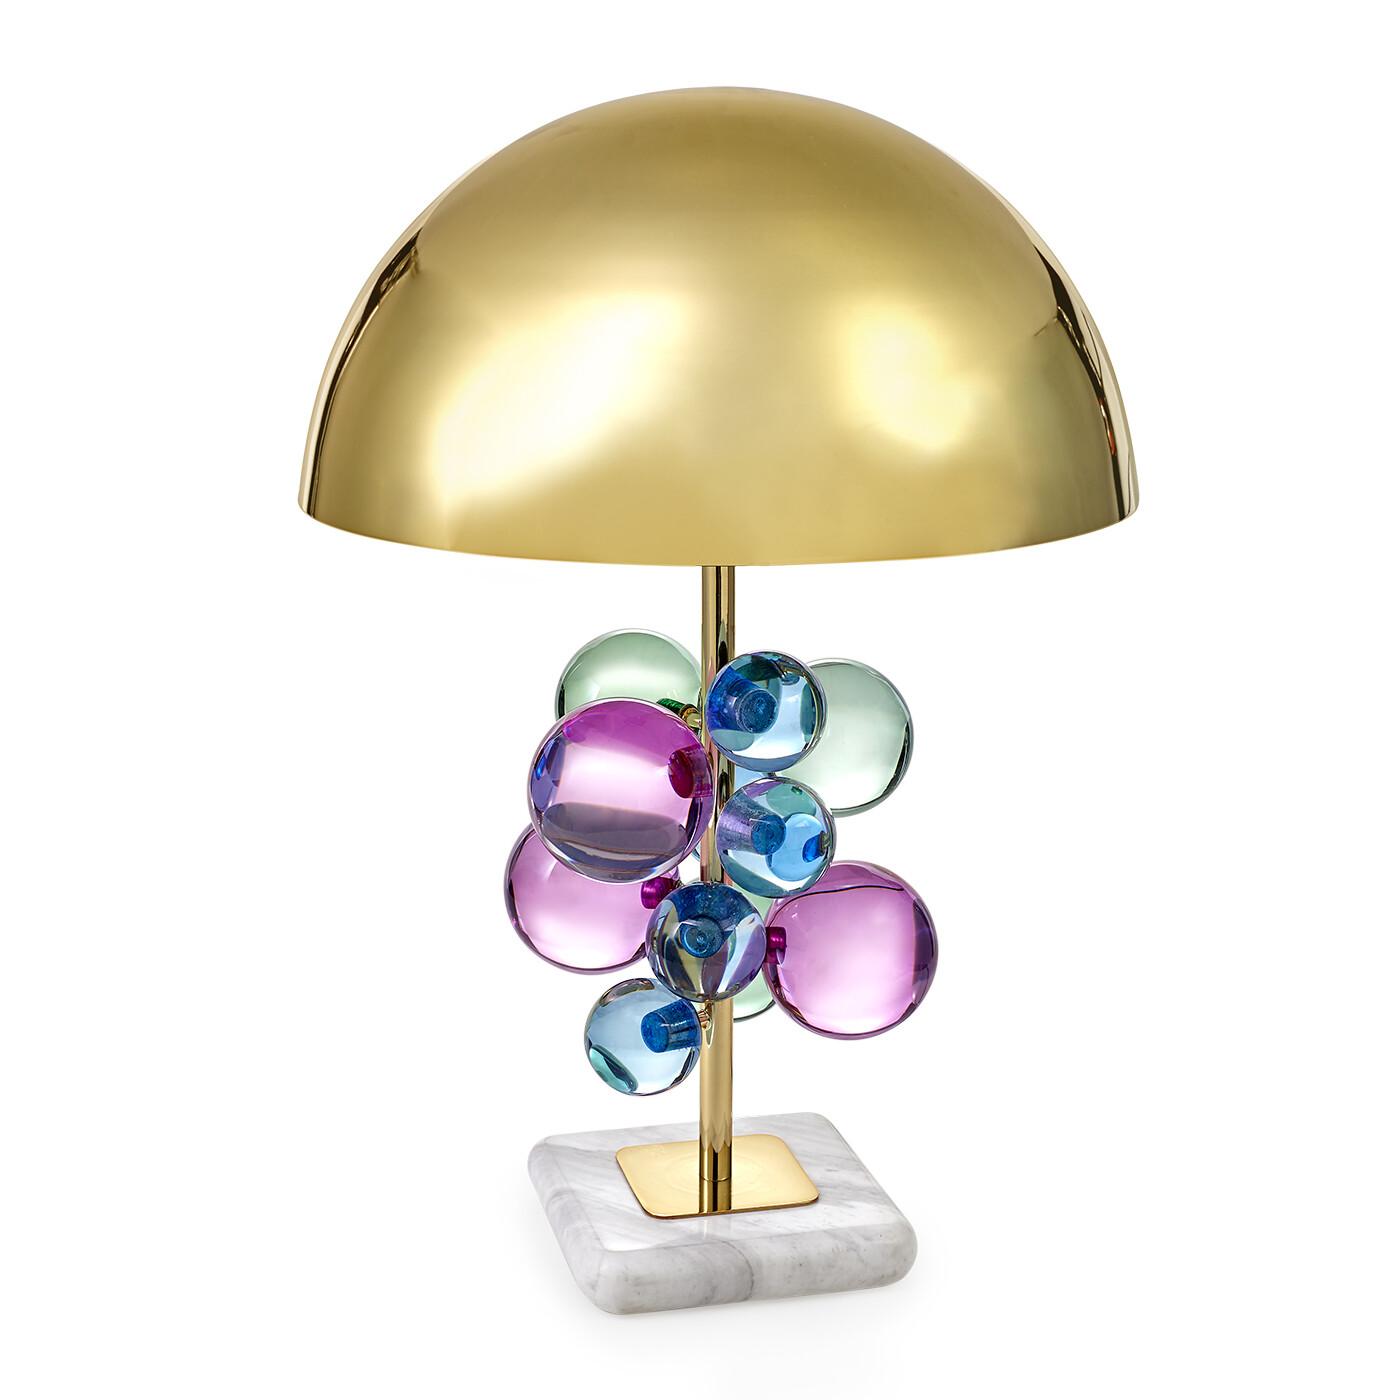 Globo Table Lamp | 2 Colors